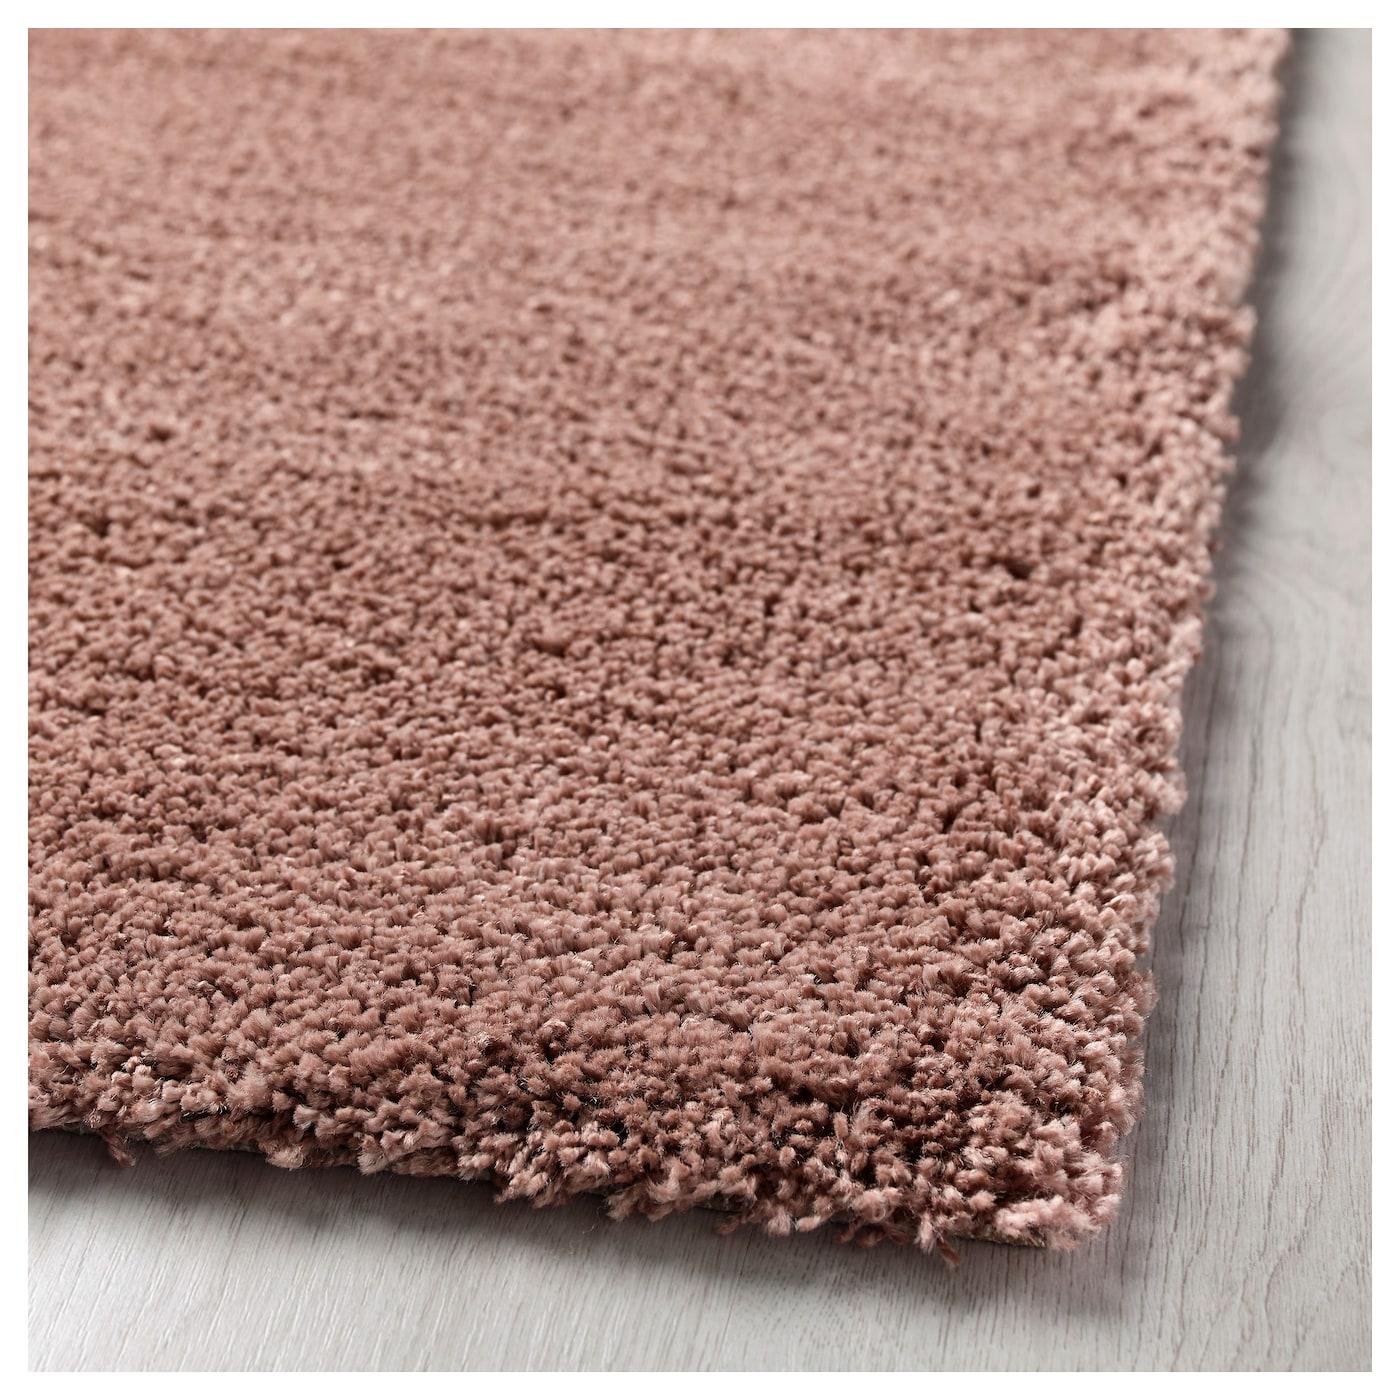 dum tapis poils hauts brun rose clair 133 x 195 cm ikea. Black Bedroom Furniture Sets. Home Design Ideas